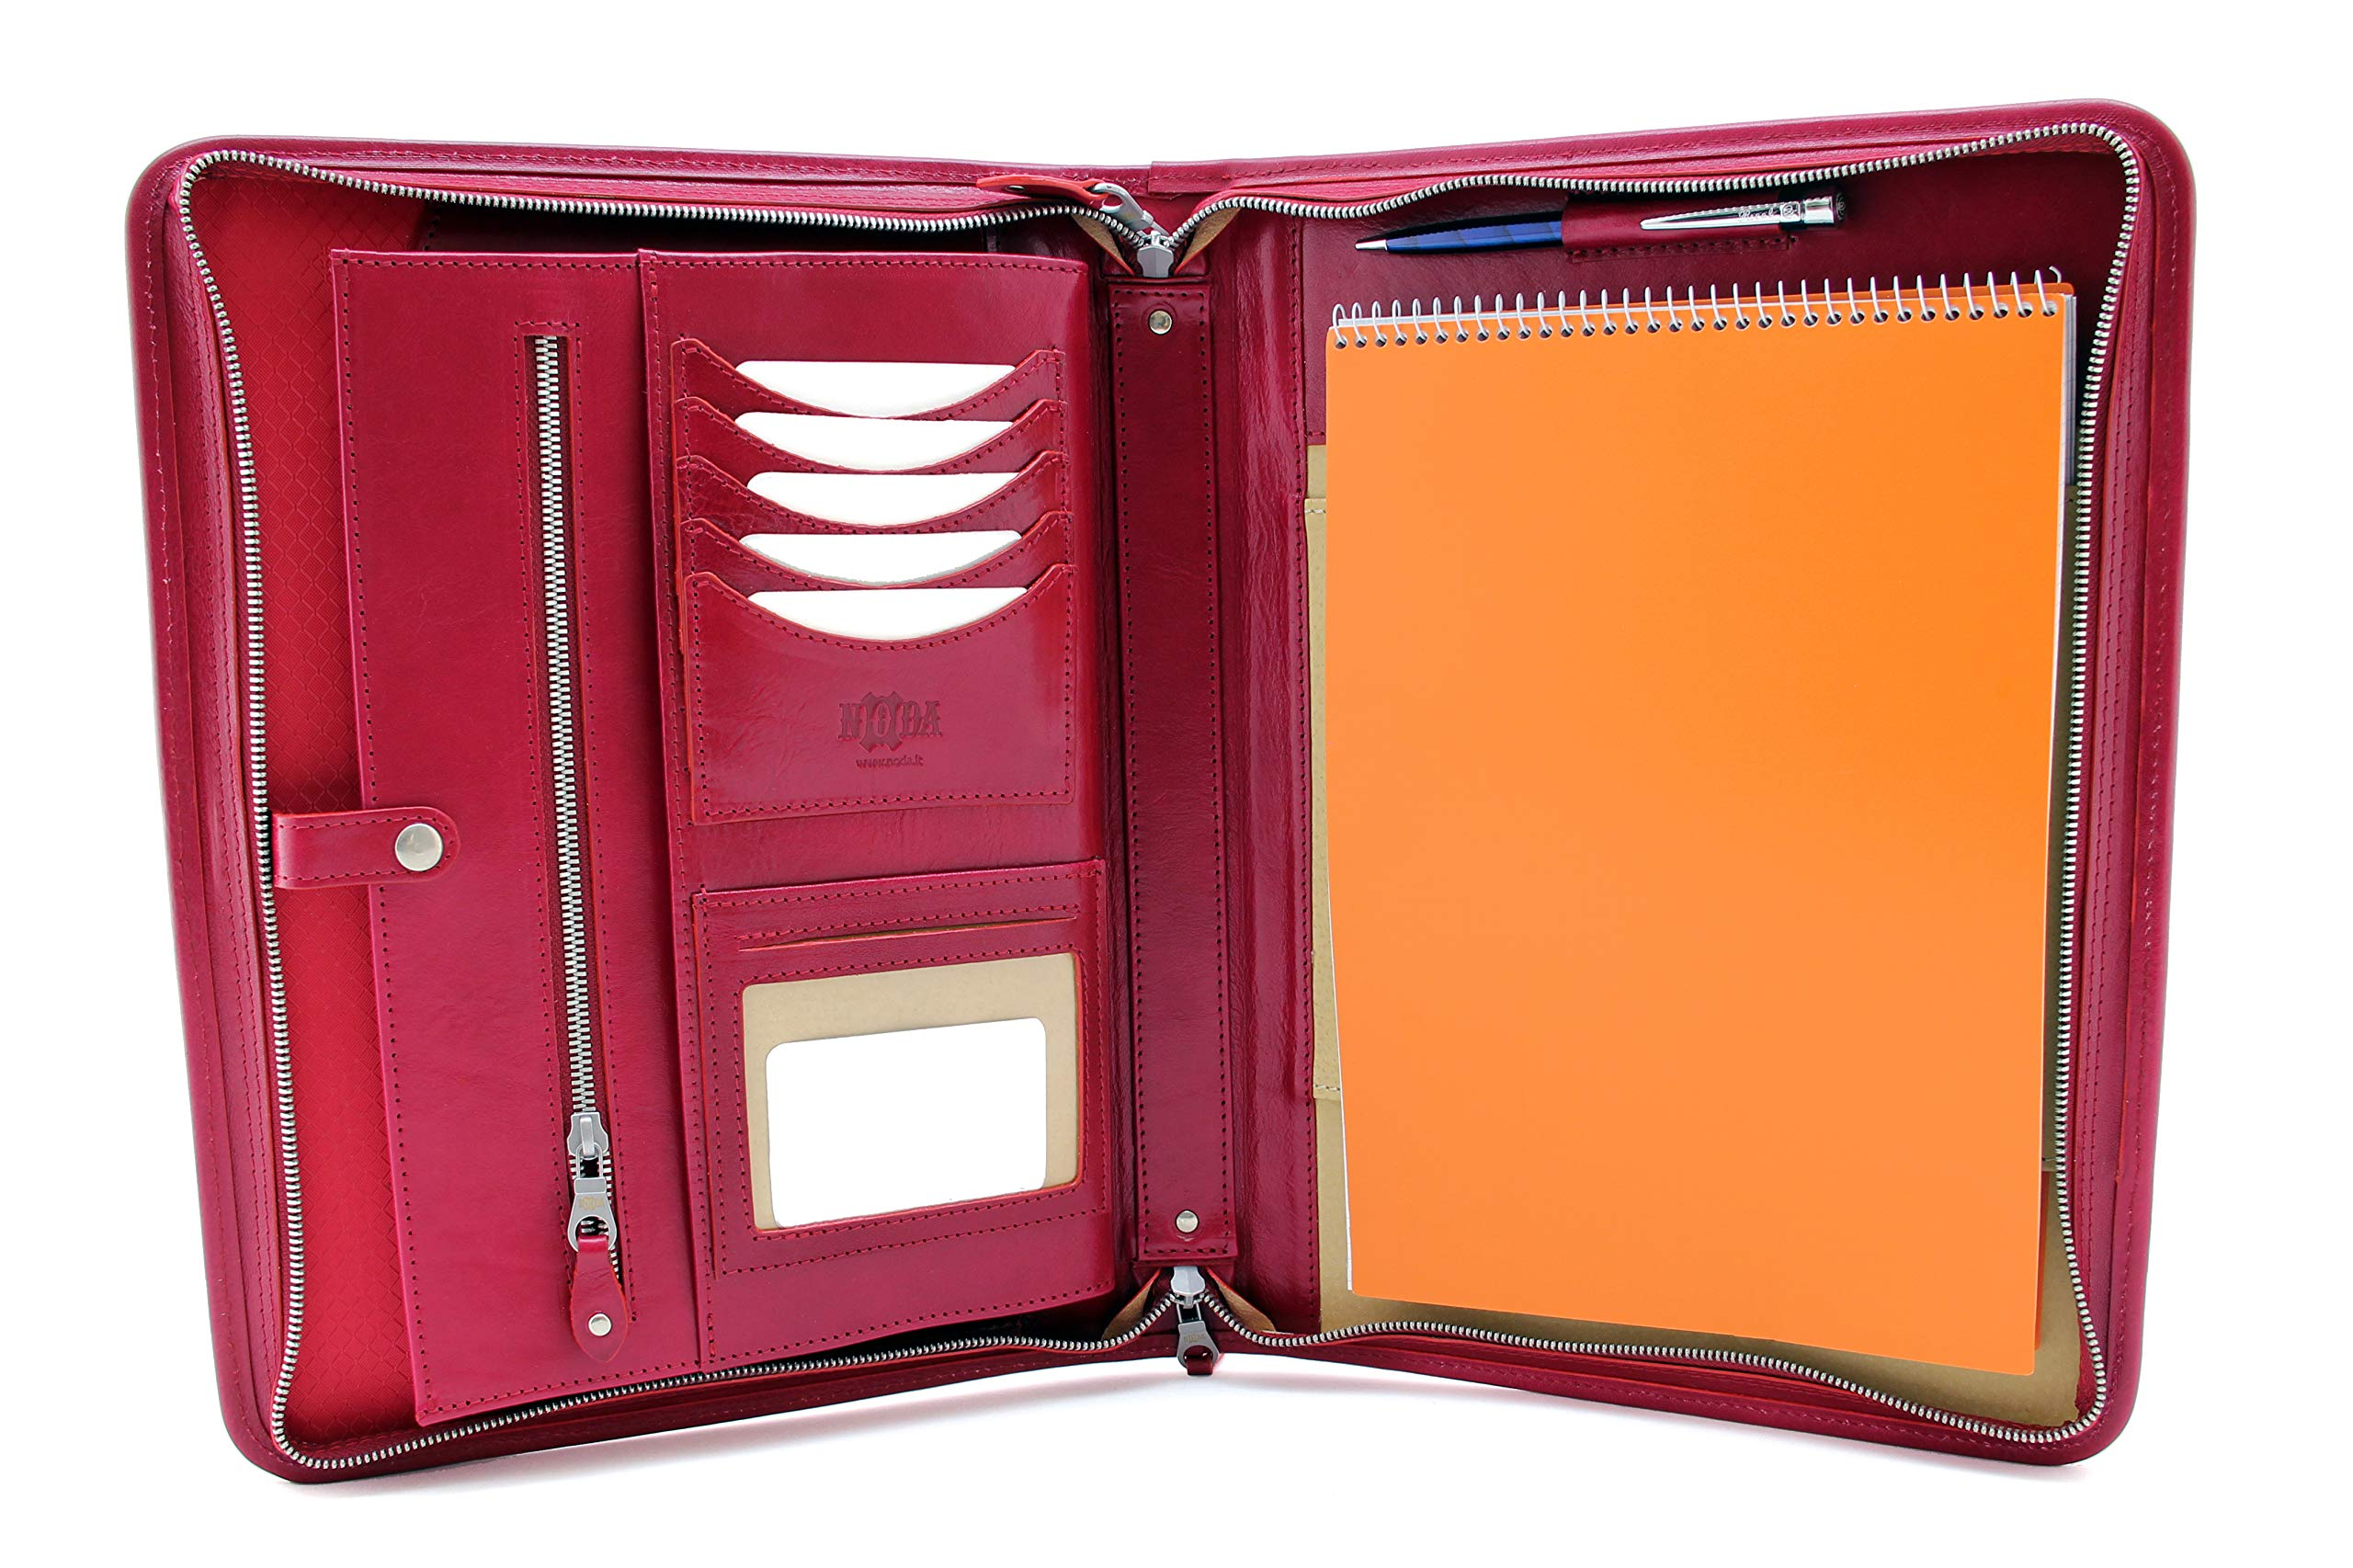 Noda Professional Padfolio - Resume Portfolio/Business Portfolio with Secure Zippered Closure, Expandable Document Organizer & Writing Pad, Italian Genuine Leather Conference Folder A4 (red)